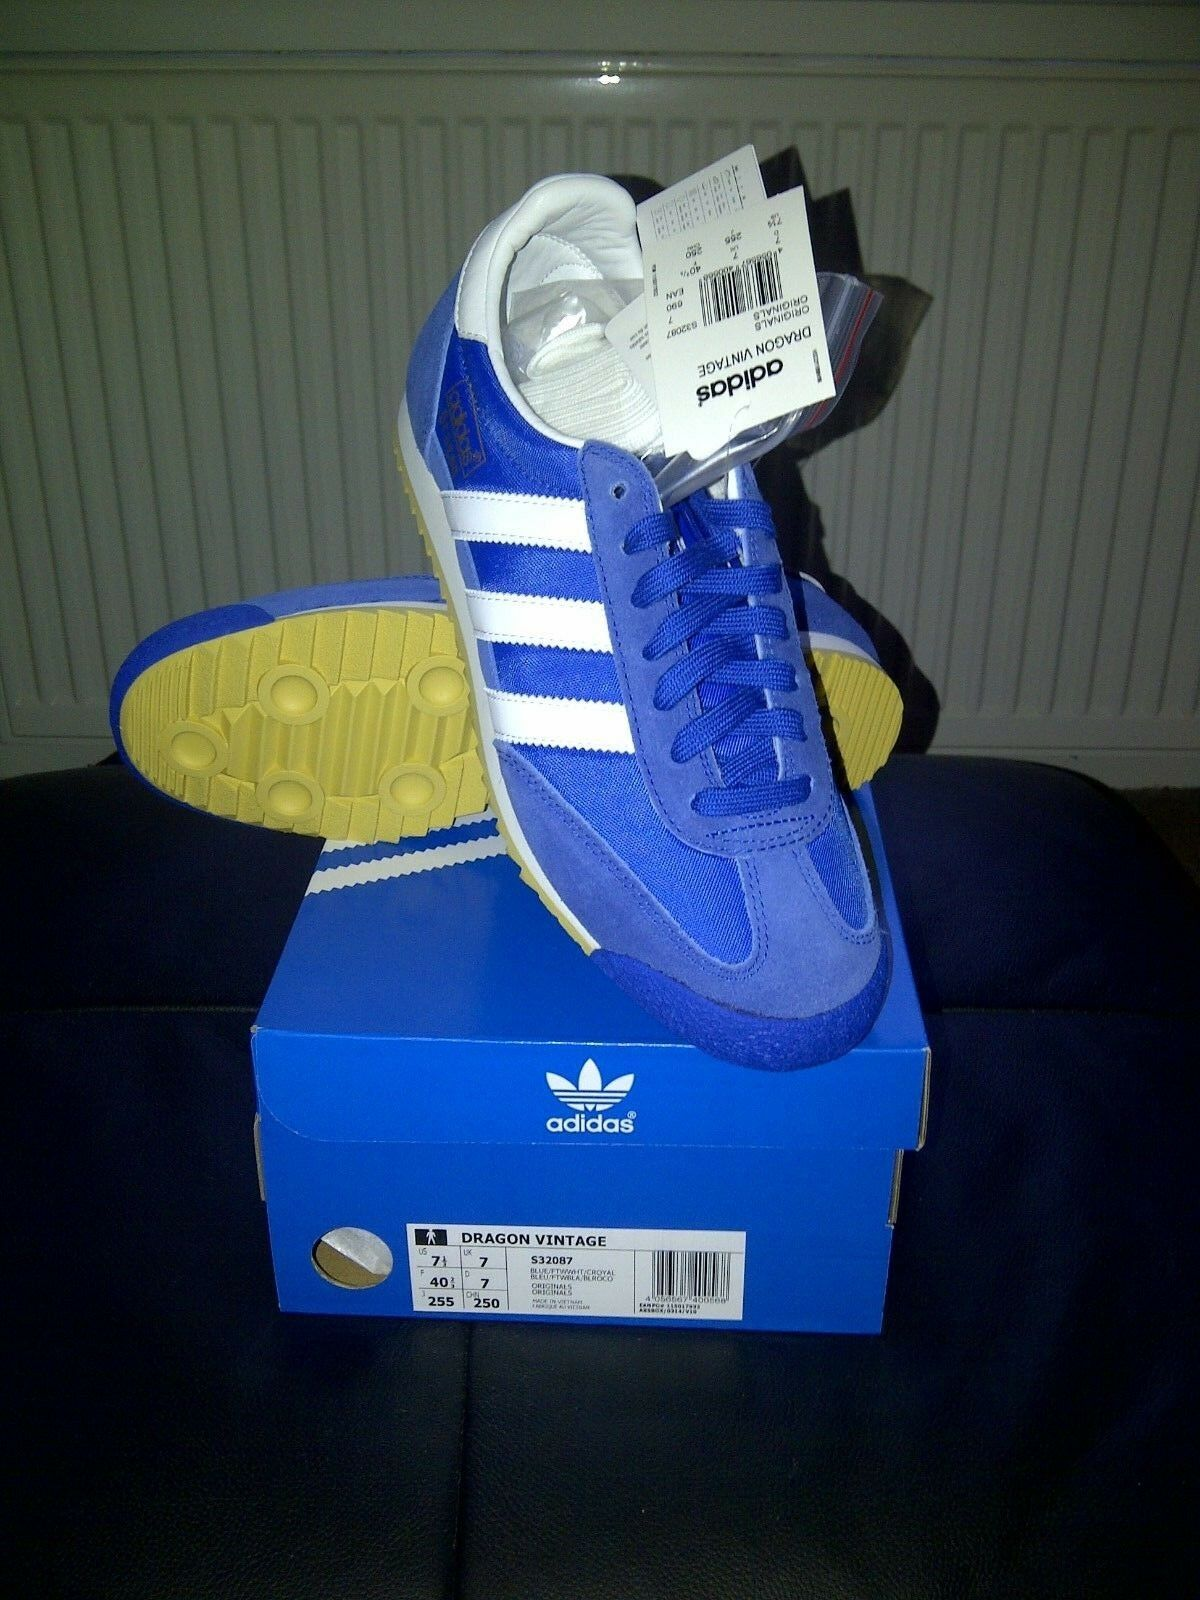 Adidas Originals Tubulaire S80244 Invader Ruban Baskets Montantes S80244 Tubulaire Baskets 6ff927